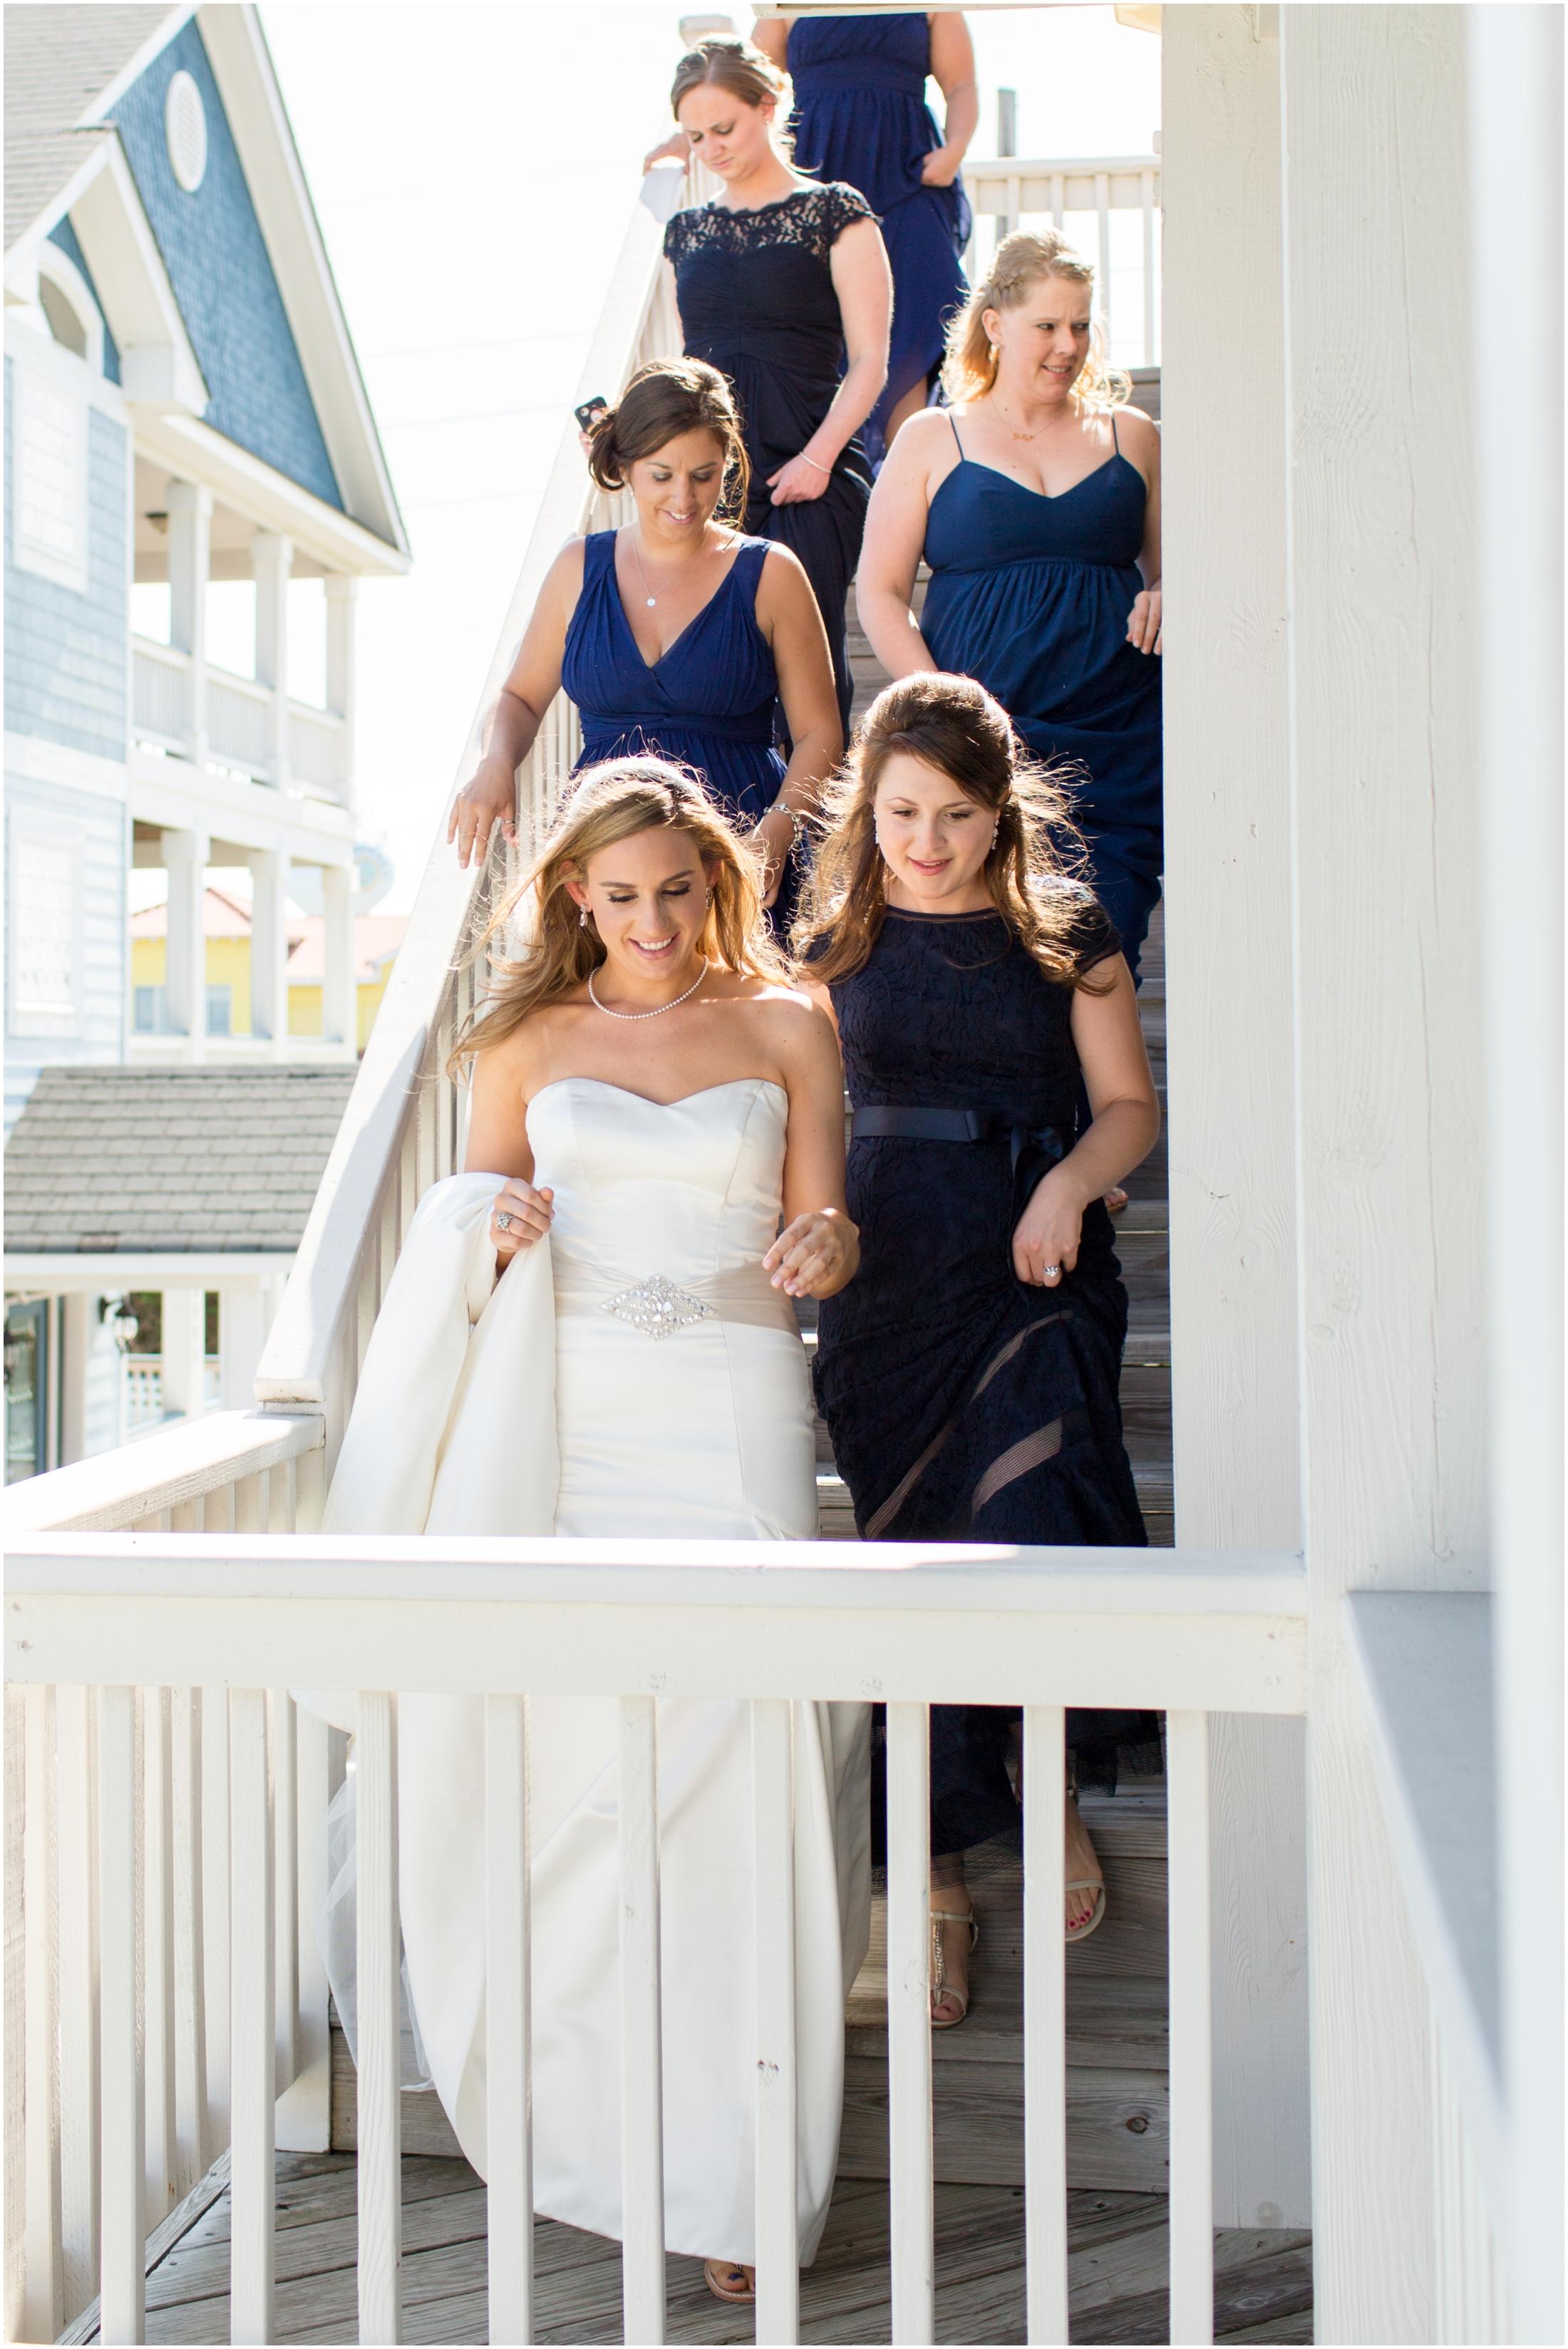 Pearce-Wedding-Bridal-Party-174.jpg